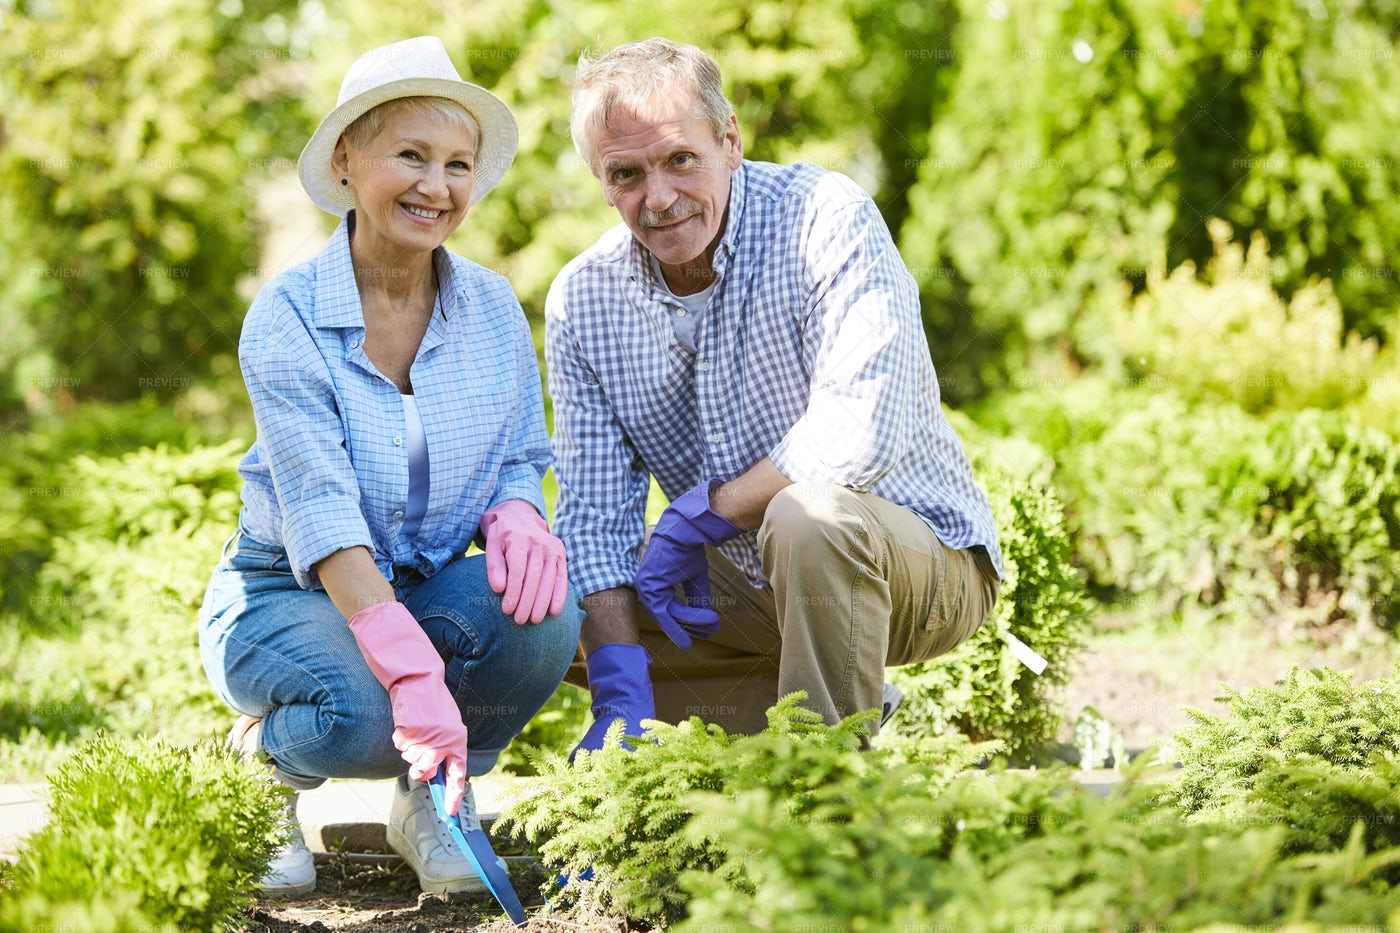 Senior Couple Gardening Together: Stock Photos